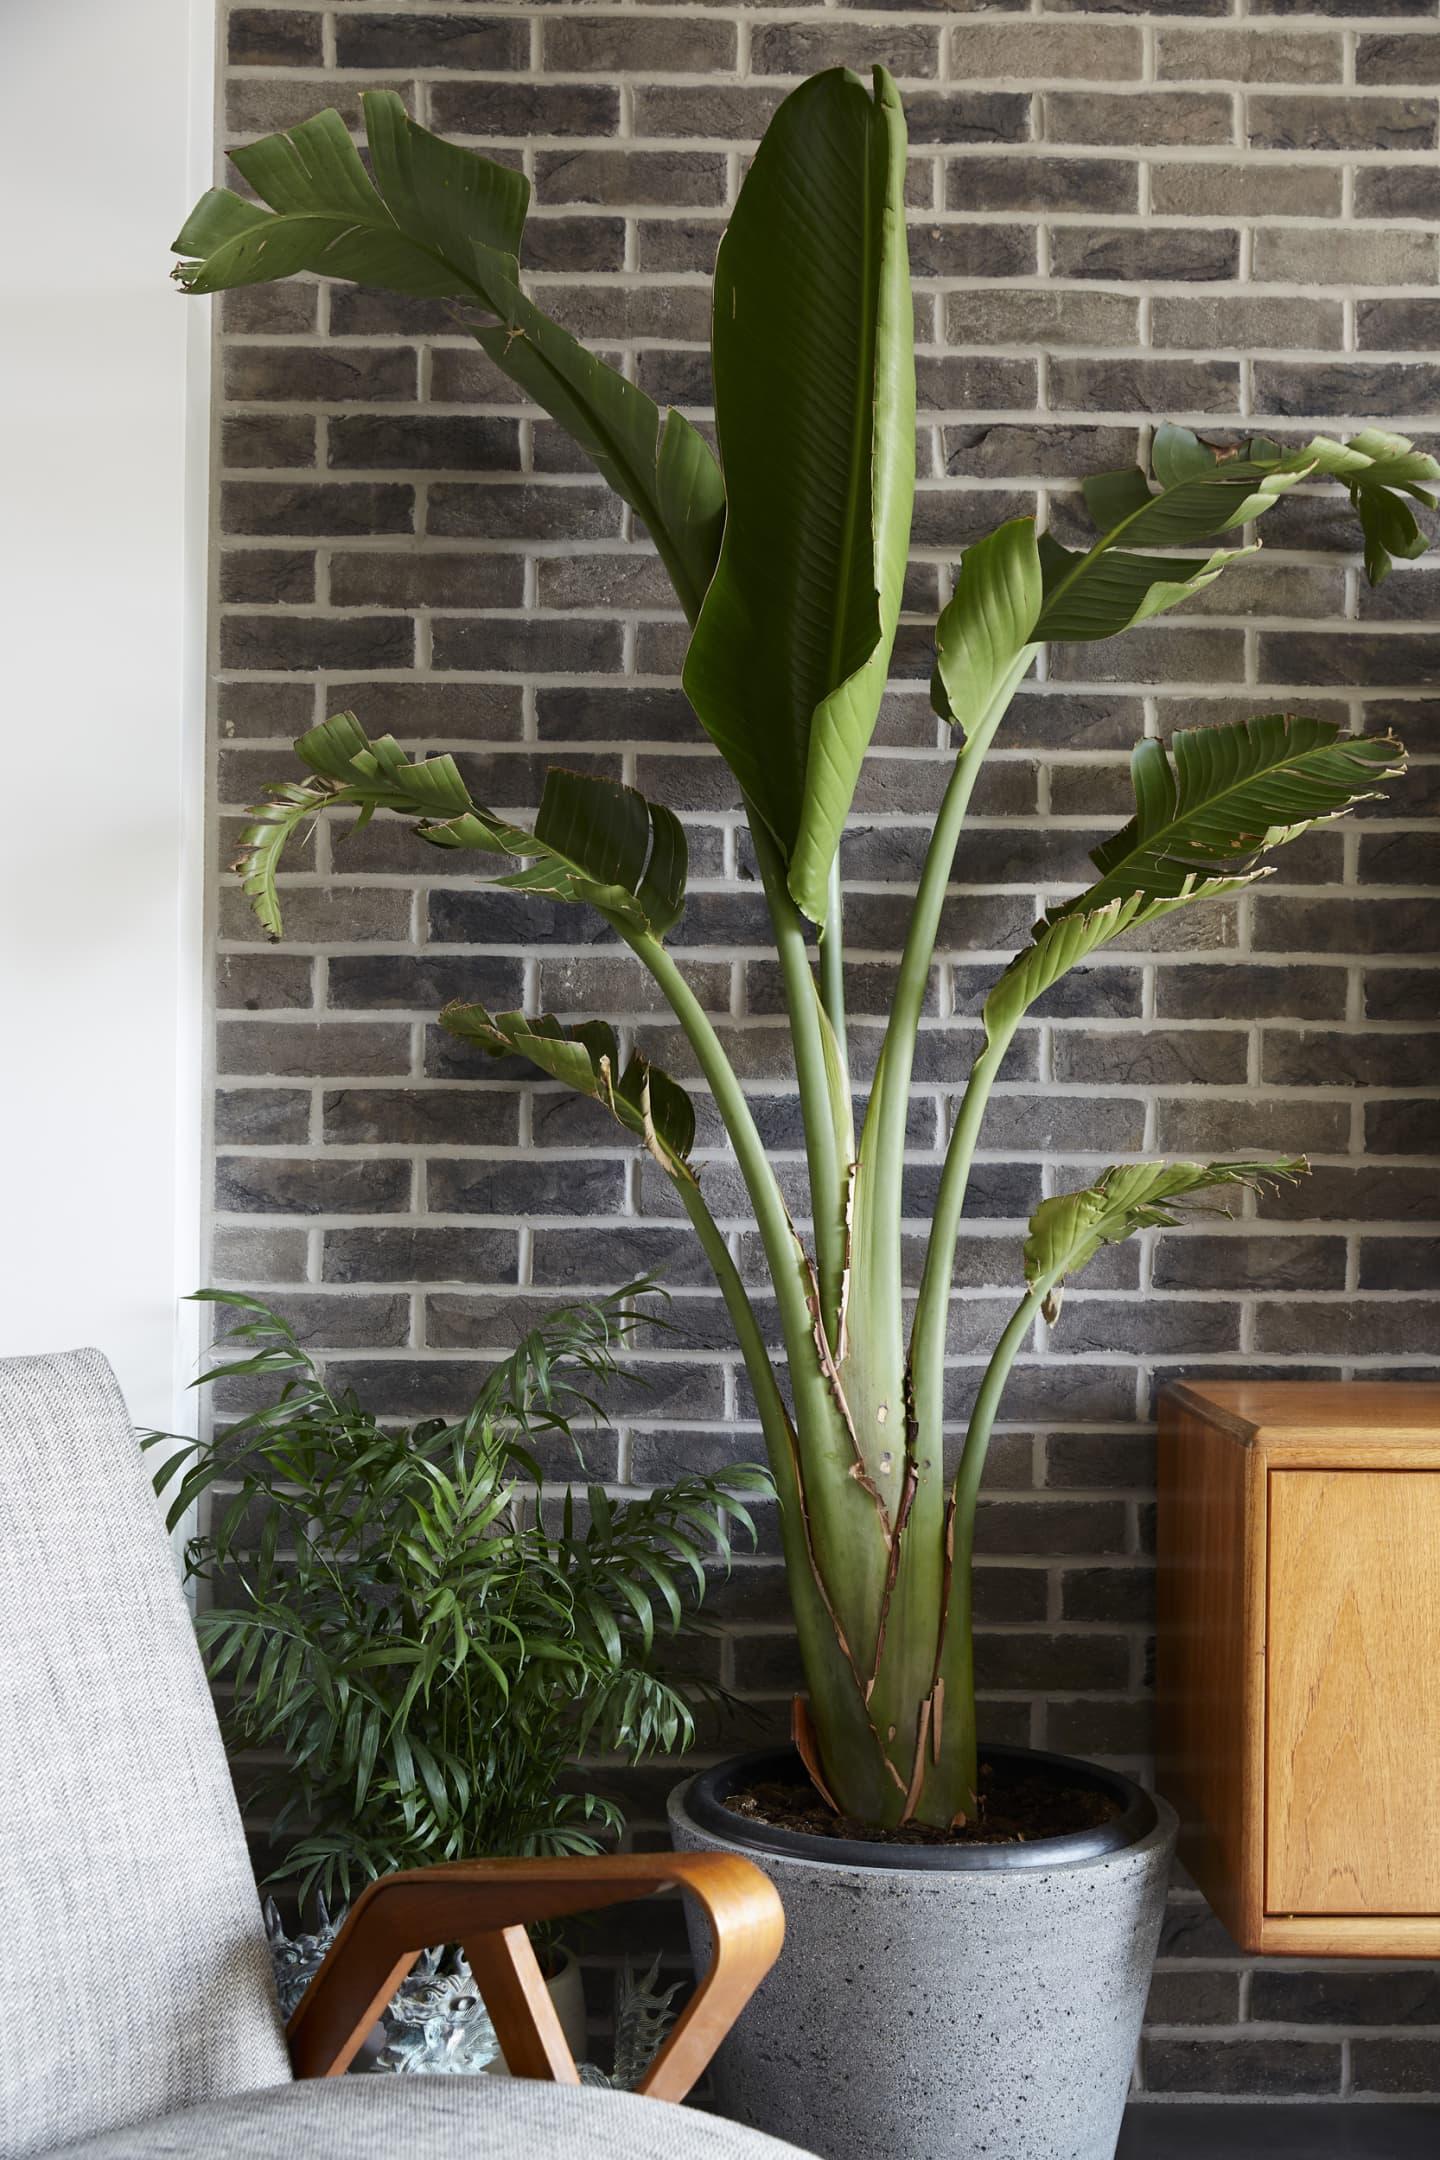 Free standing plant